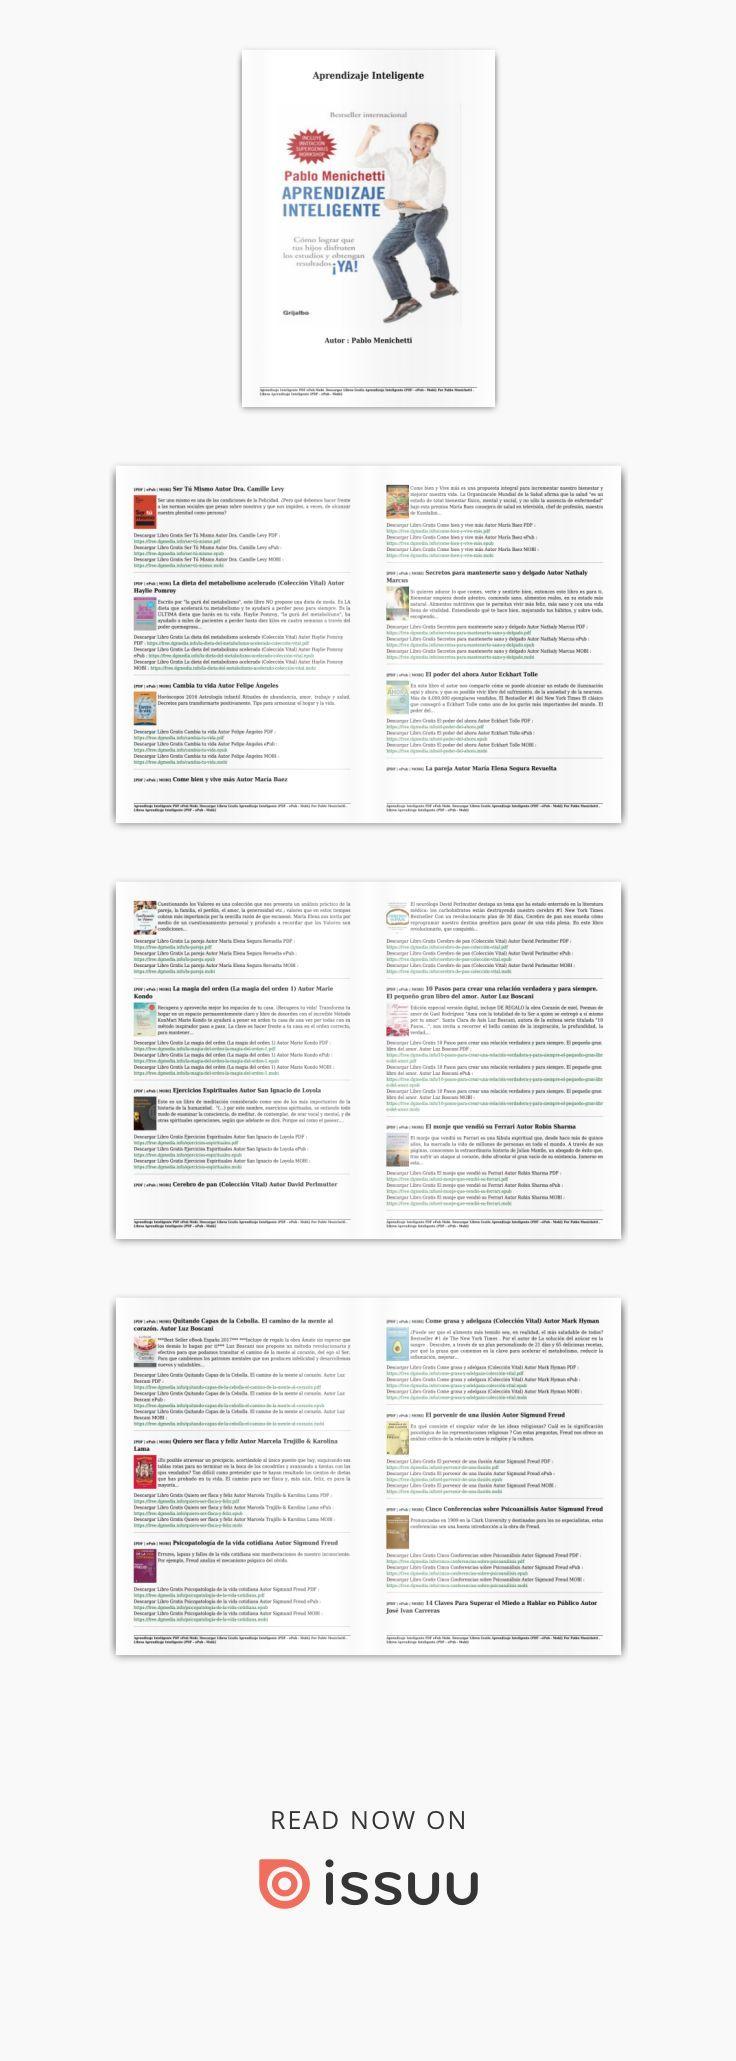 Descargar libros gratis aprendizaje inteligente (pdf epub mobi} authort pablo menichetti